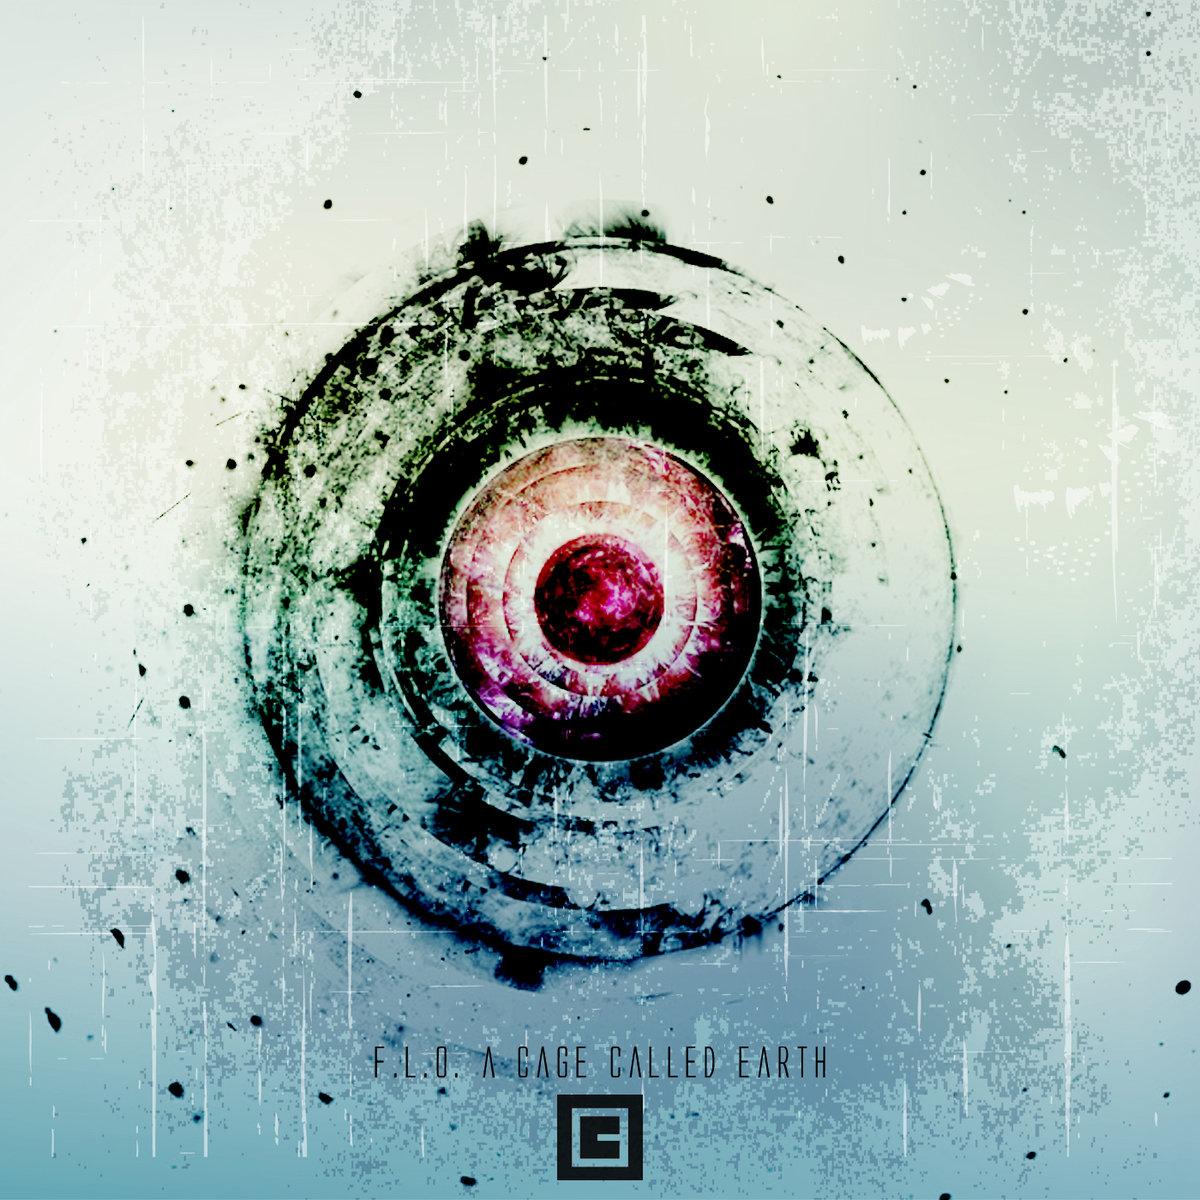 52. F.L.O. - A Cage Called Earth